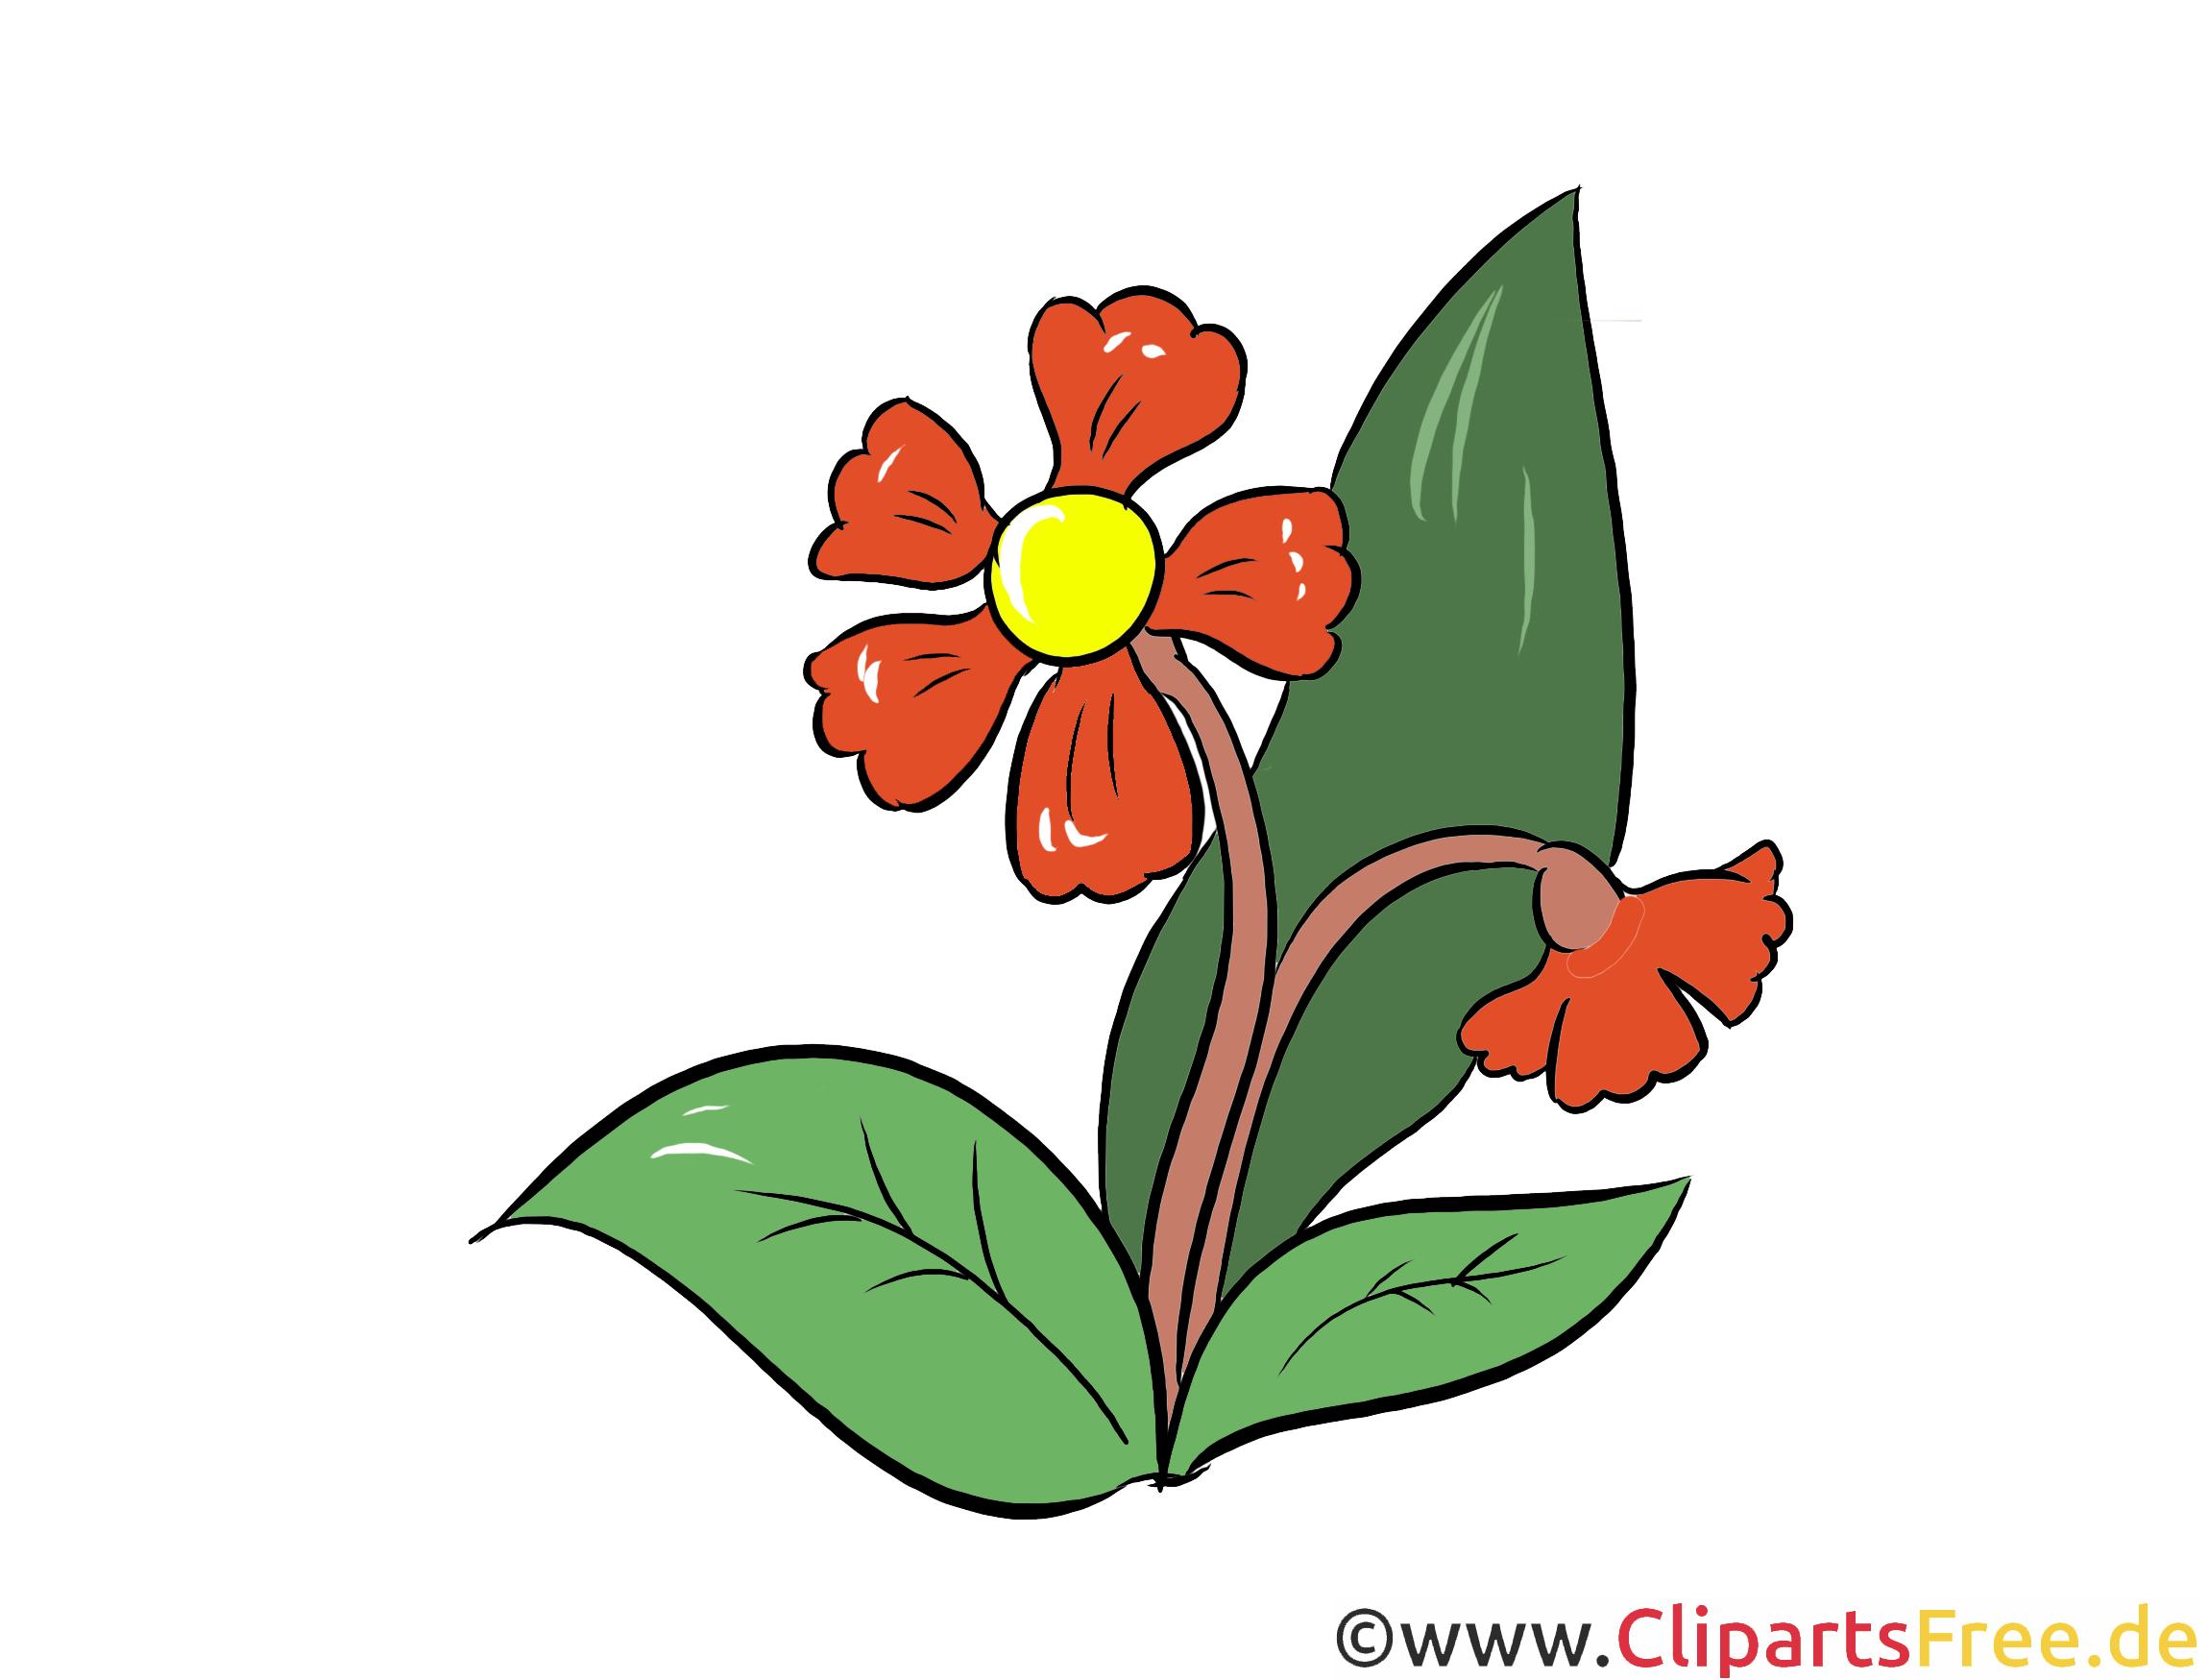 Margerite Clipart, Illustration, Bild kostenlos